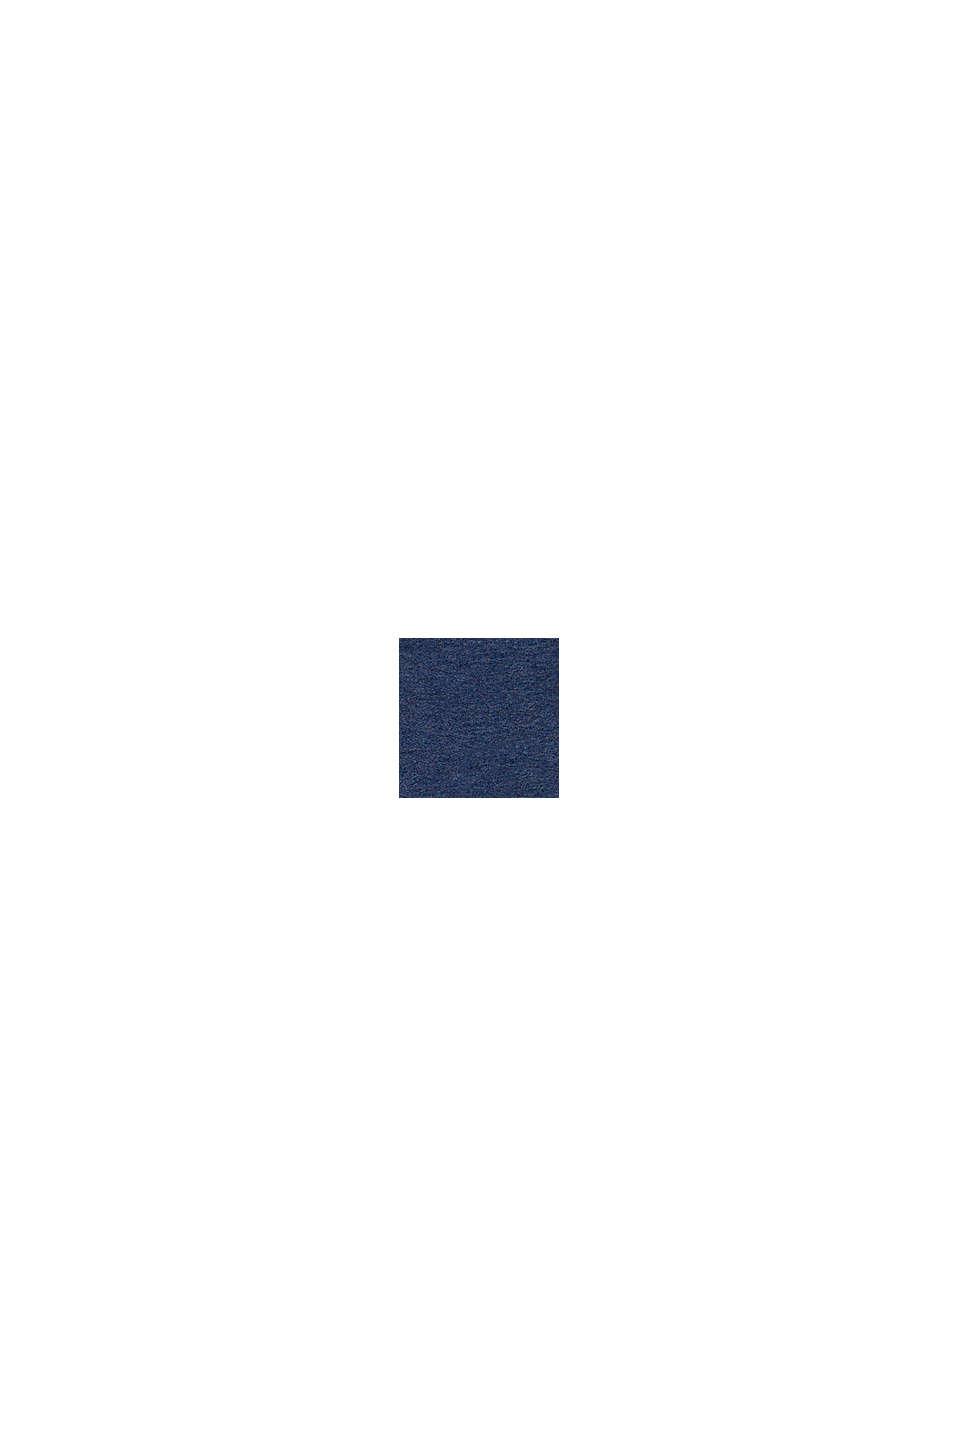 Huvtröja med dragkedja i ekobomull, BLUE, swatch